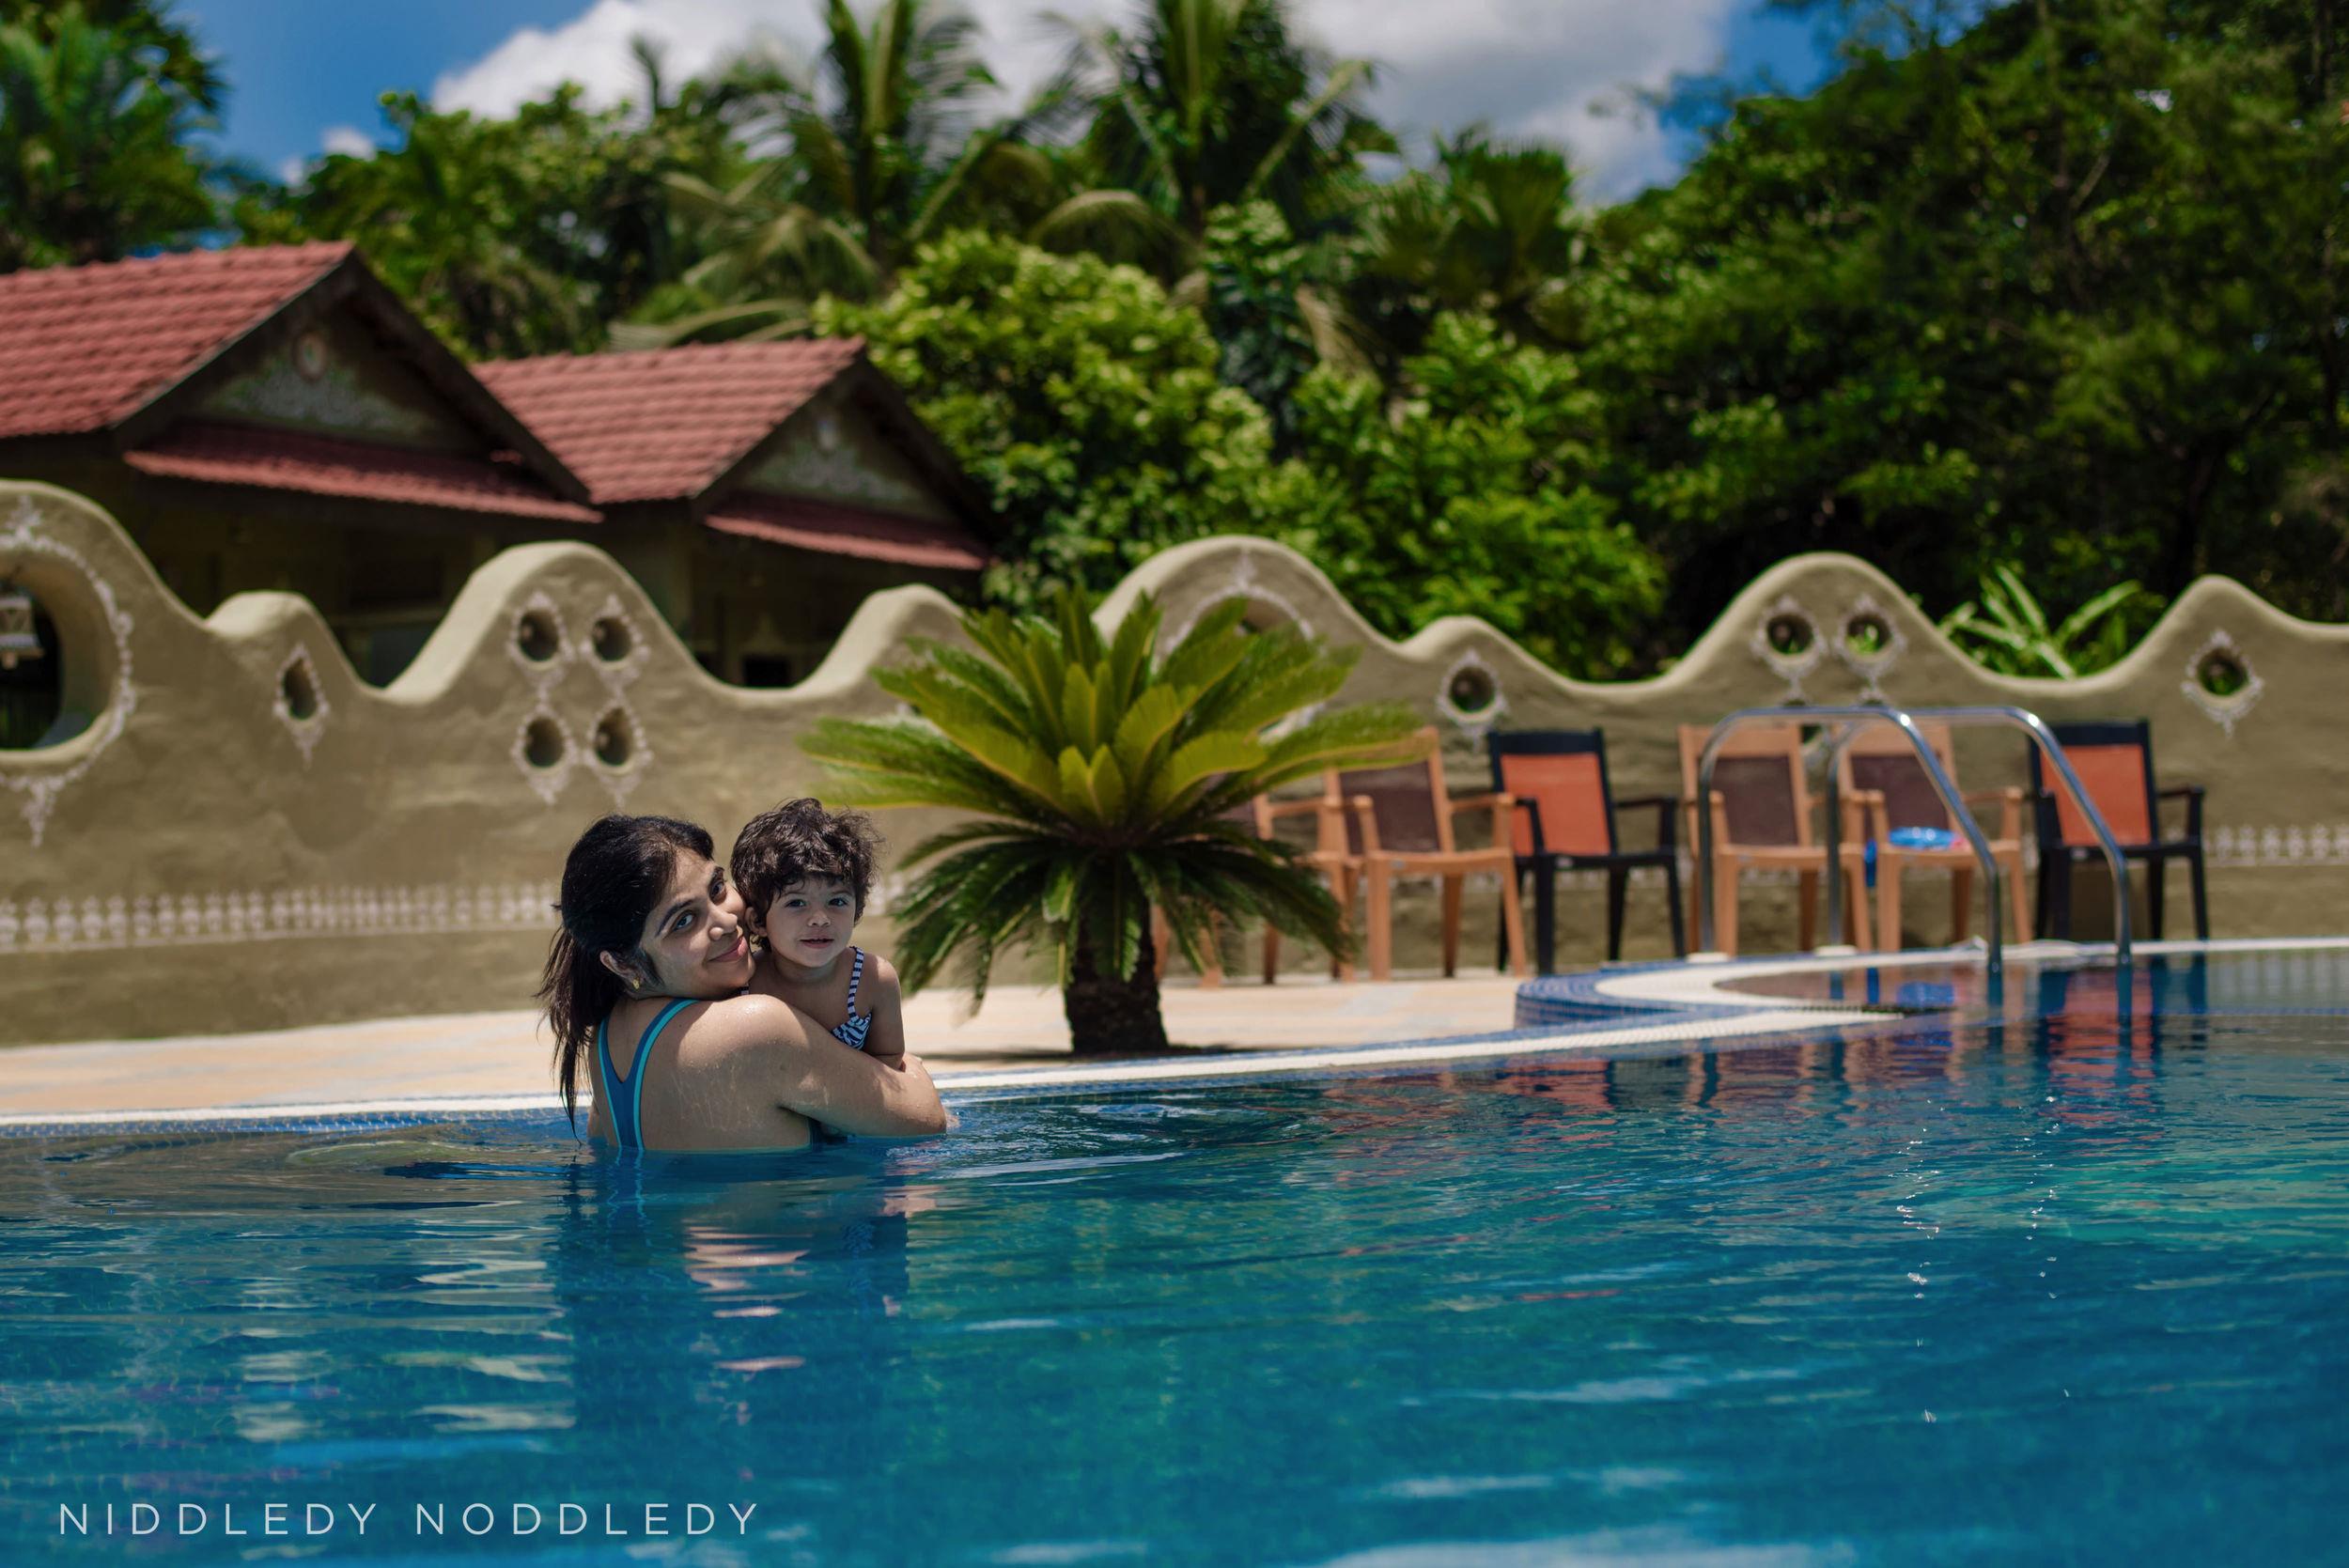 Best Photographer ❤ NiddledyNoddledy.com ~ Prenatal, Newborn and Child Photography, Calcutta - 10.jpg